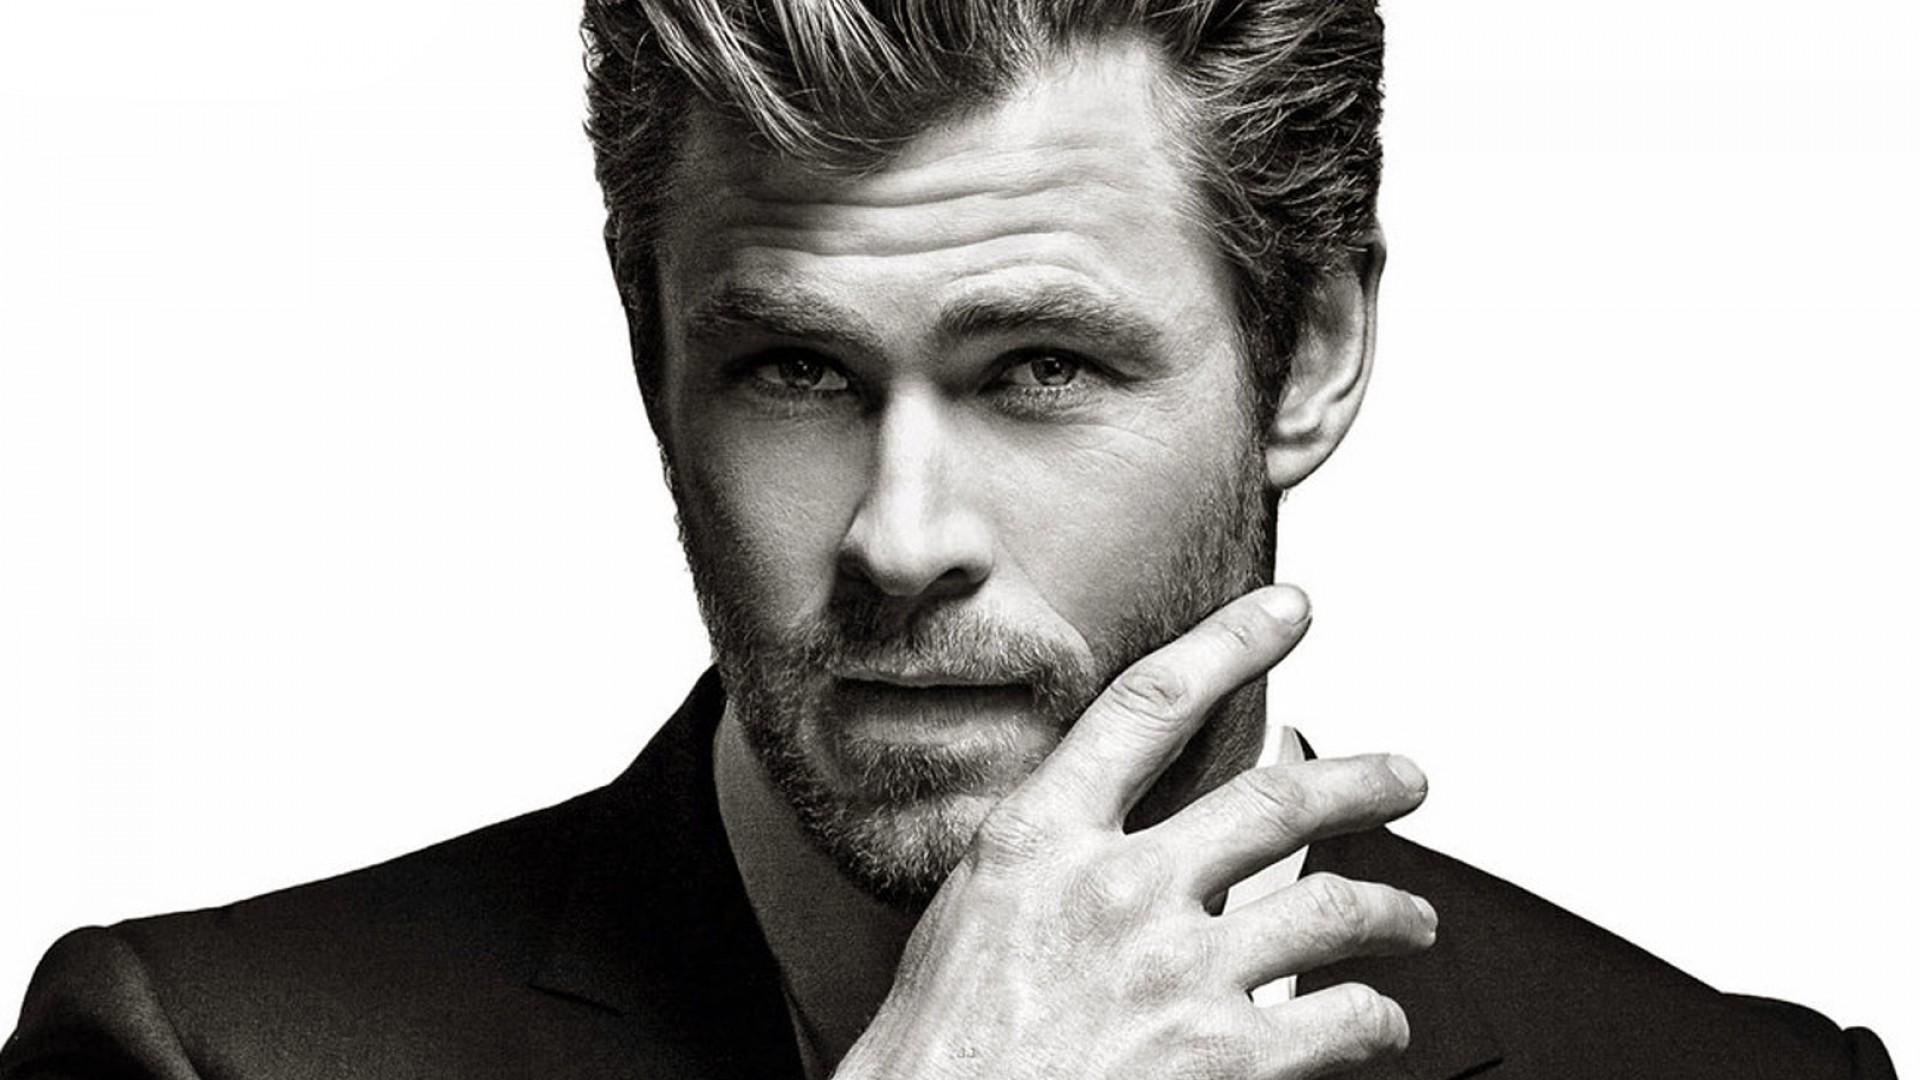 Chris Hemsworth HD Wallpaper   Stylish HD Wallpapers 1920x1080